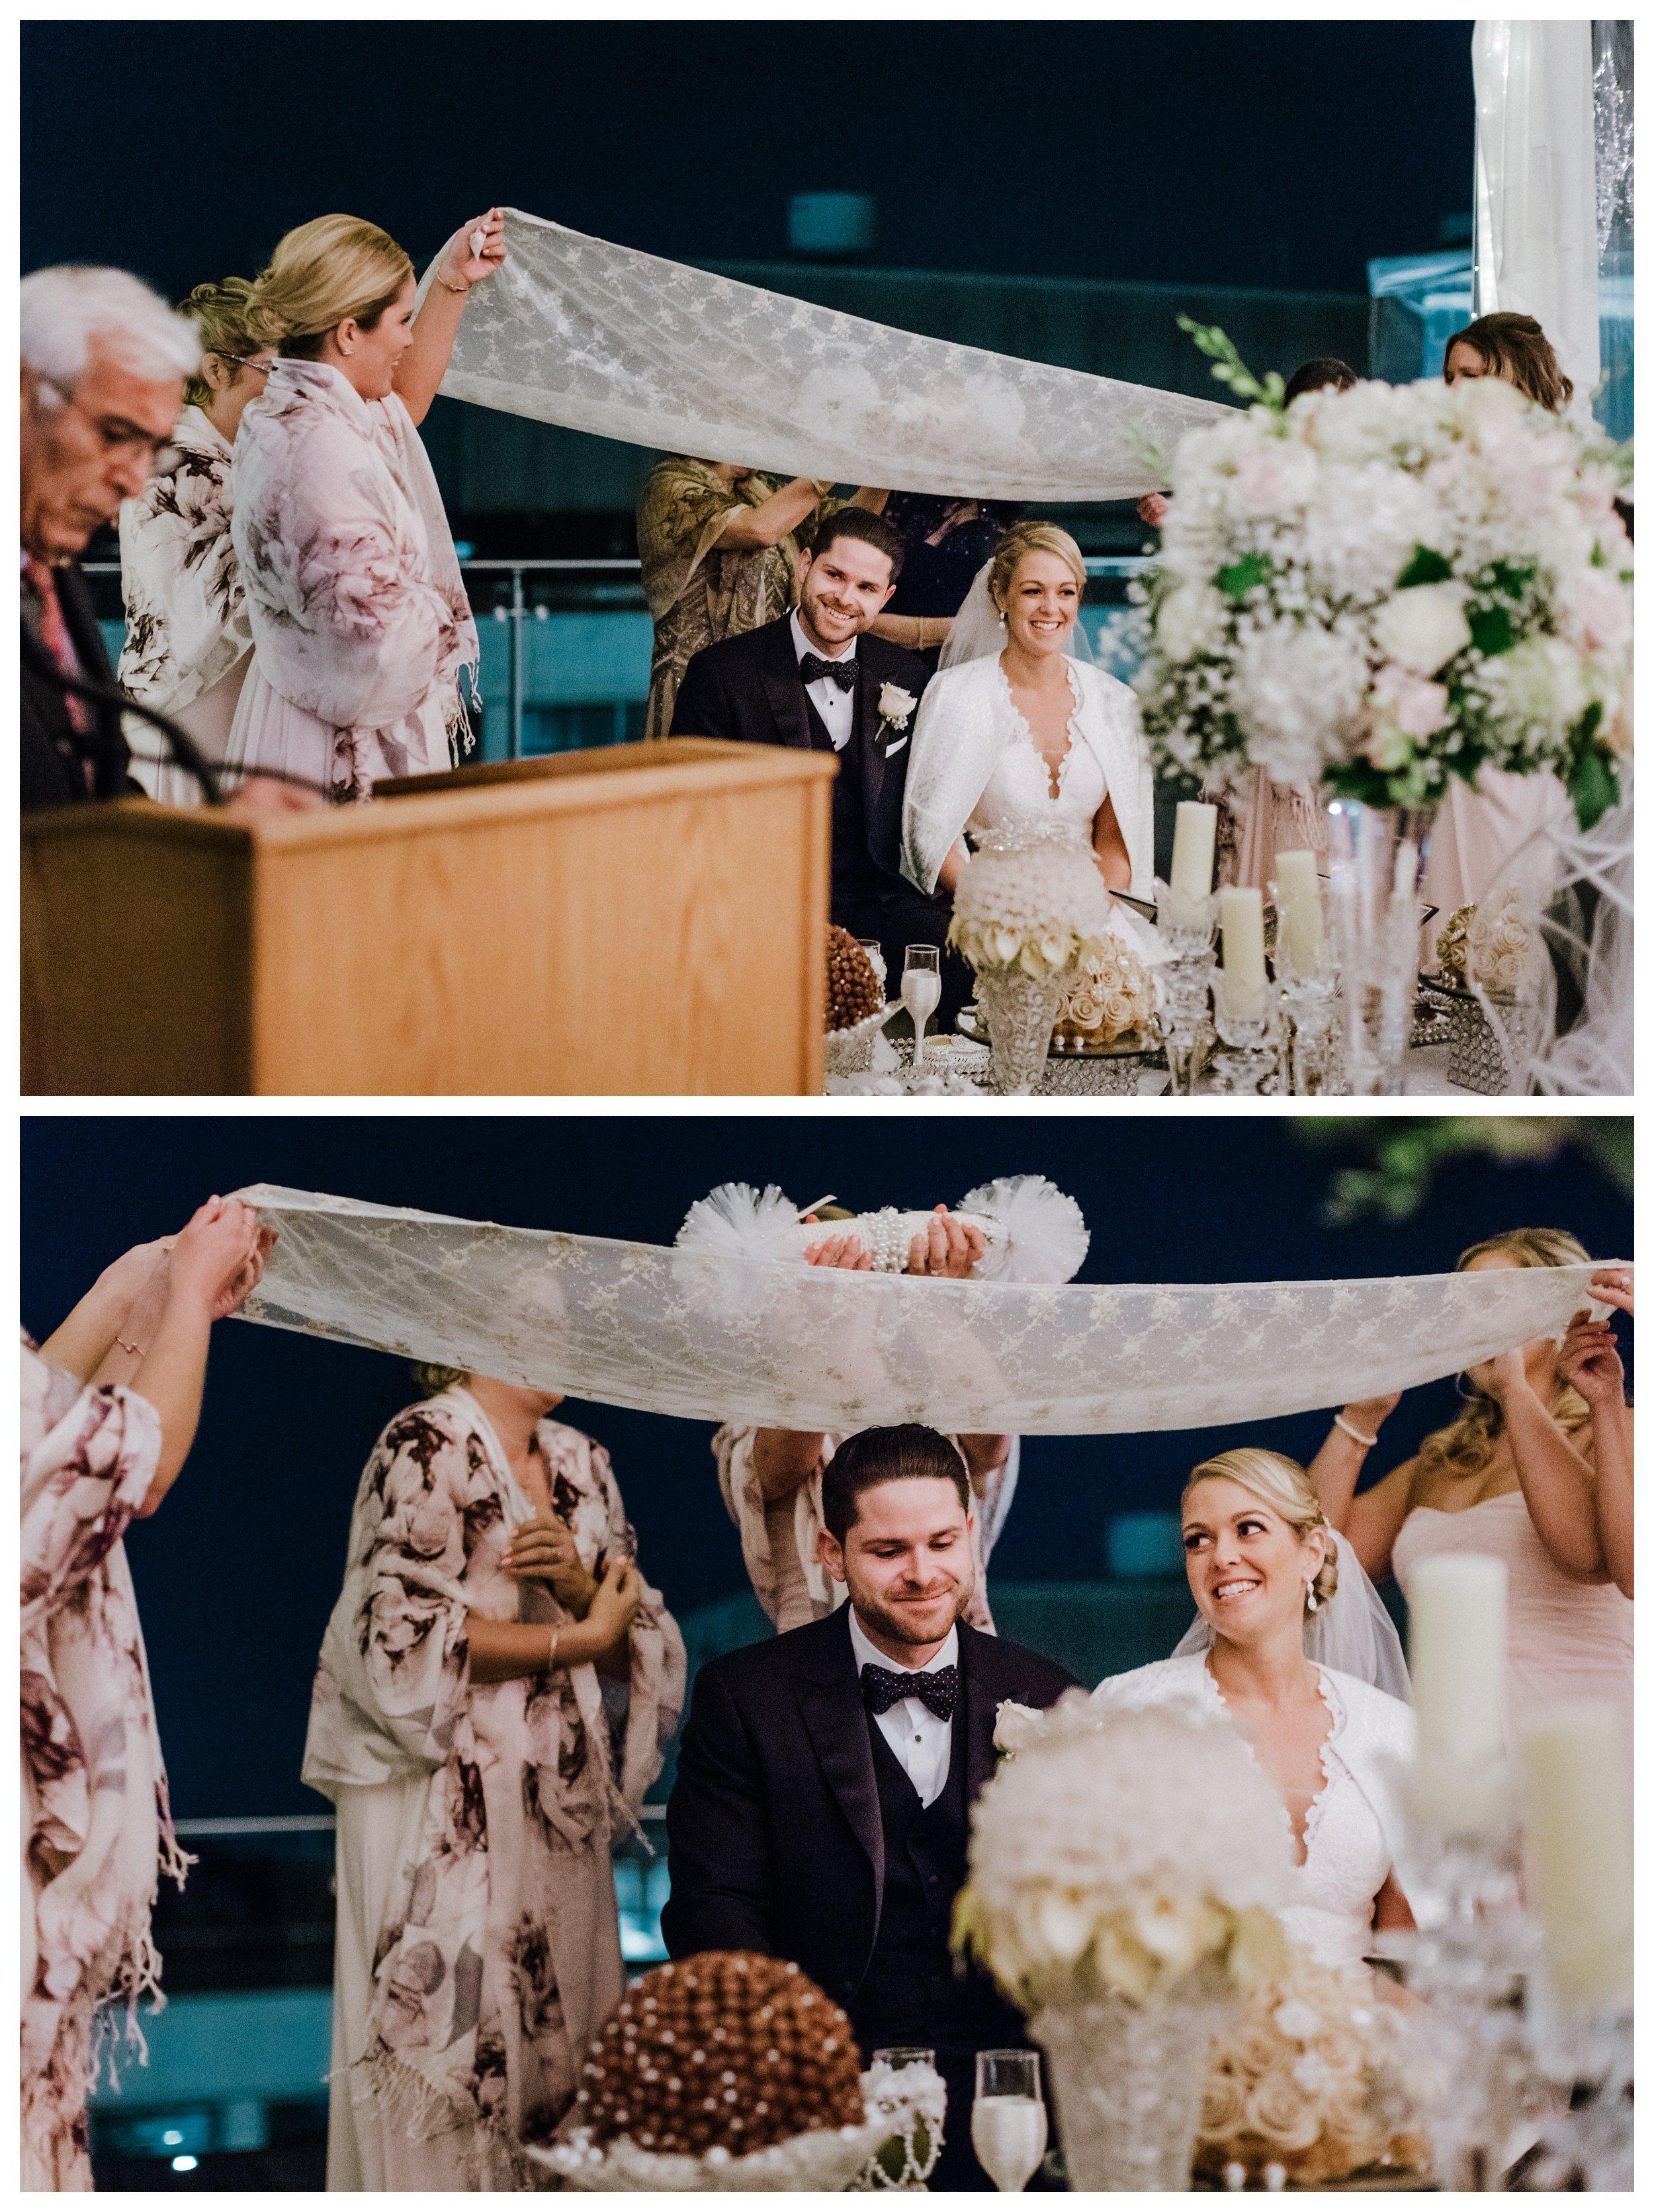 washington-dc-wedding-photographer-39.JPG